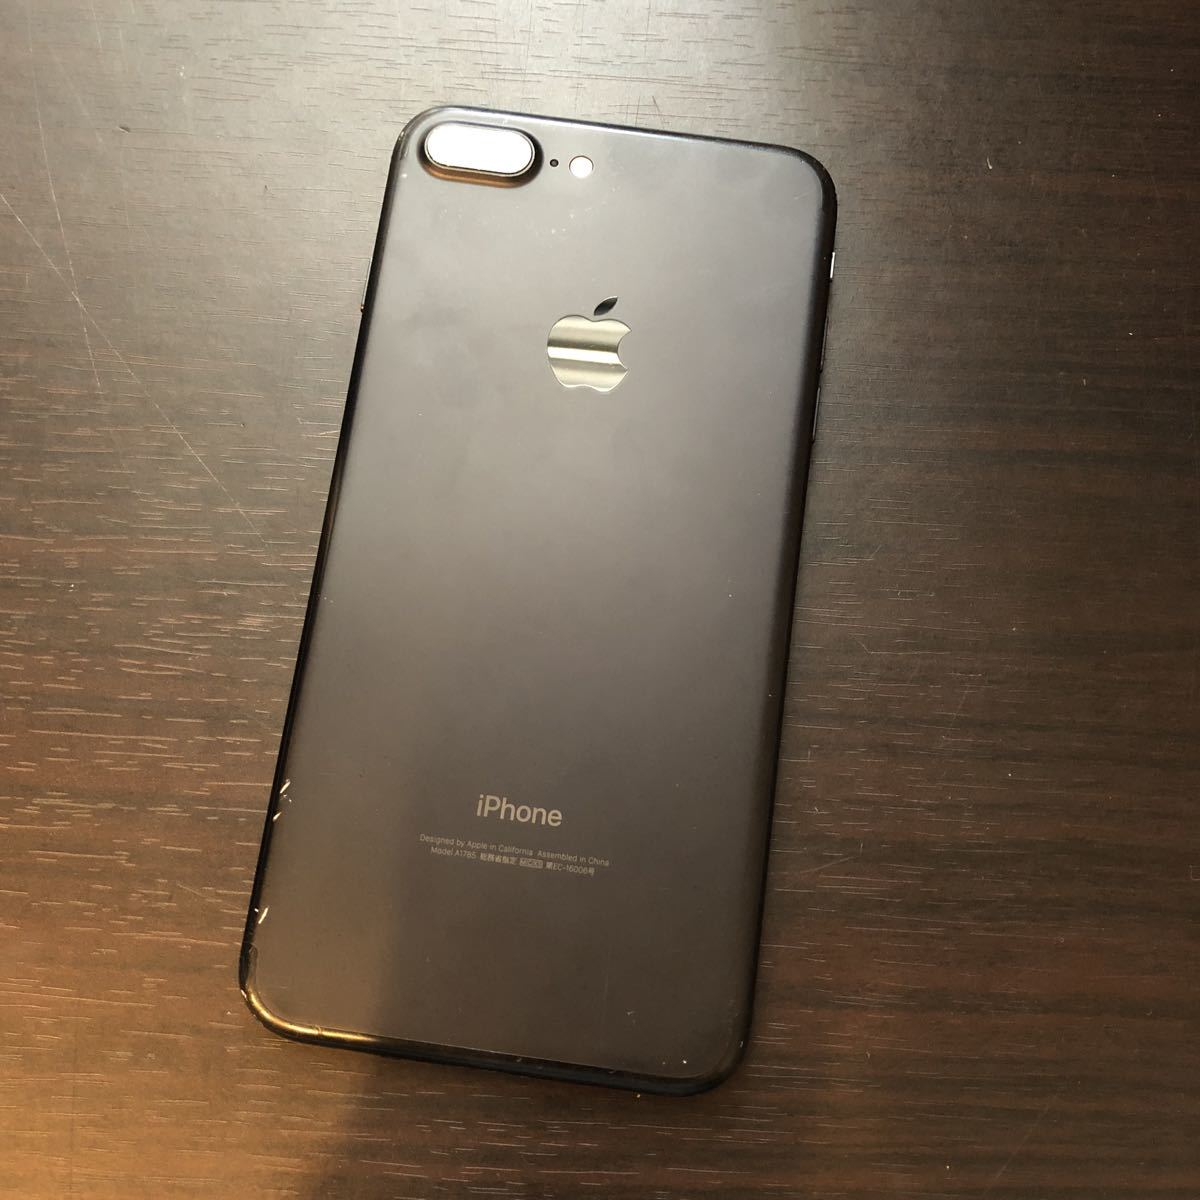 iPhone7Plus 256GB SIMフリー ブラック 中古良品 [1505]_画像2